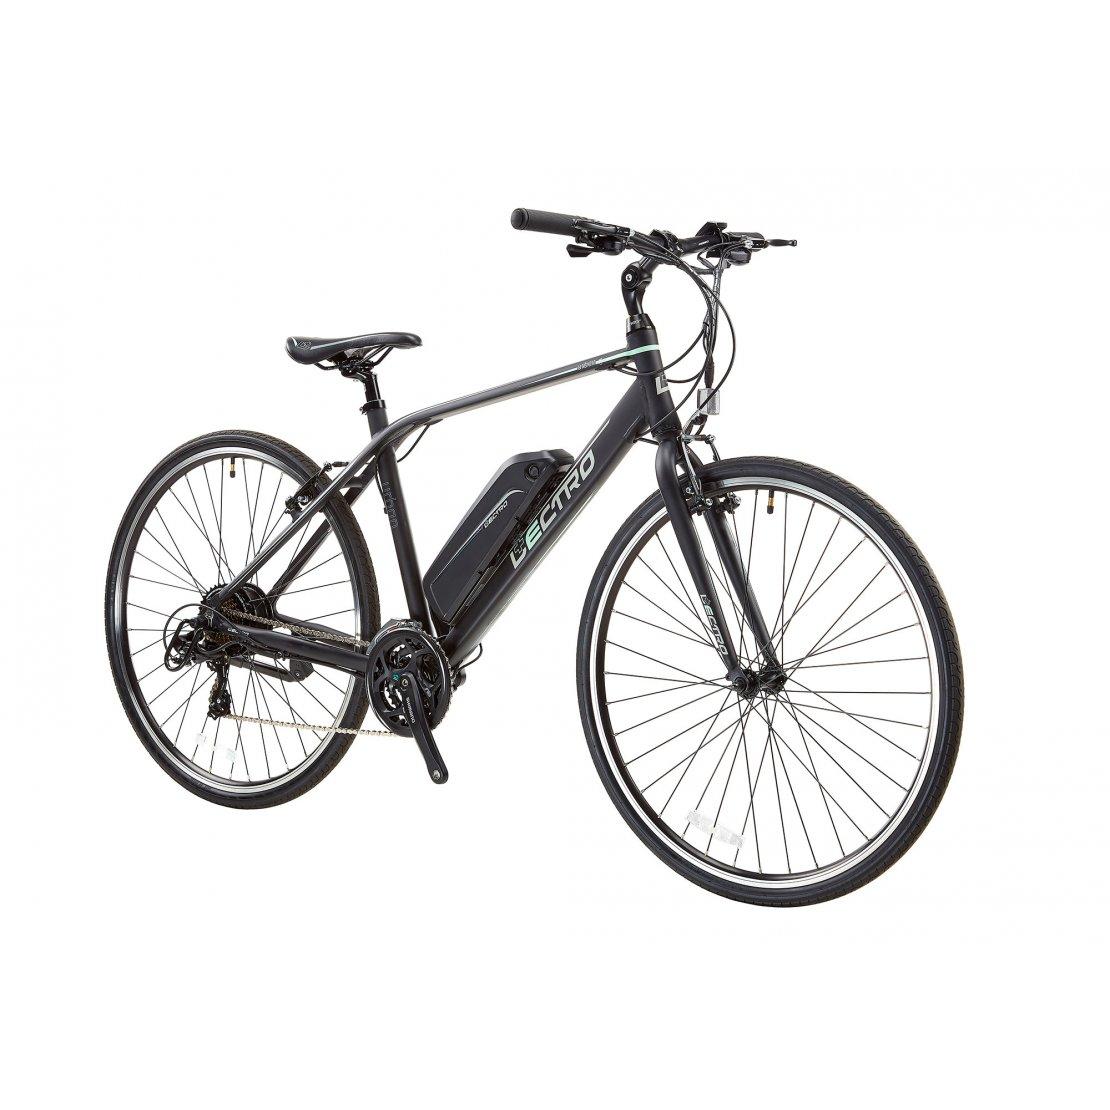 19 Urban Race 21 Speed 36v E Bike 700c Wheel Gents